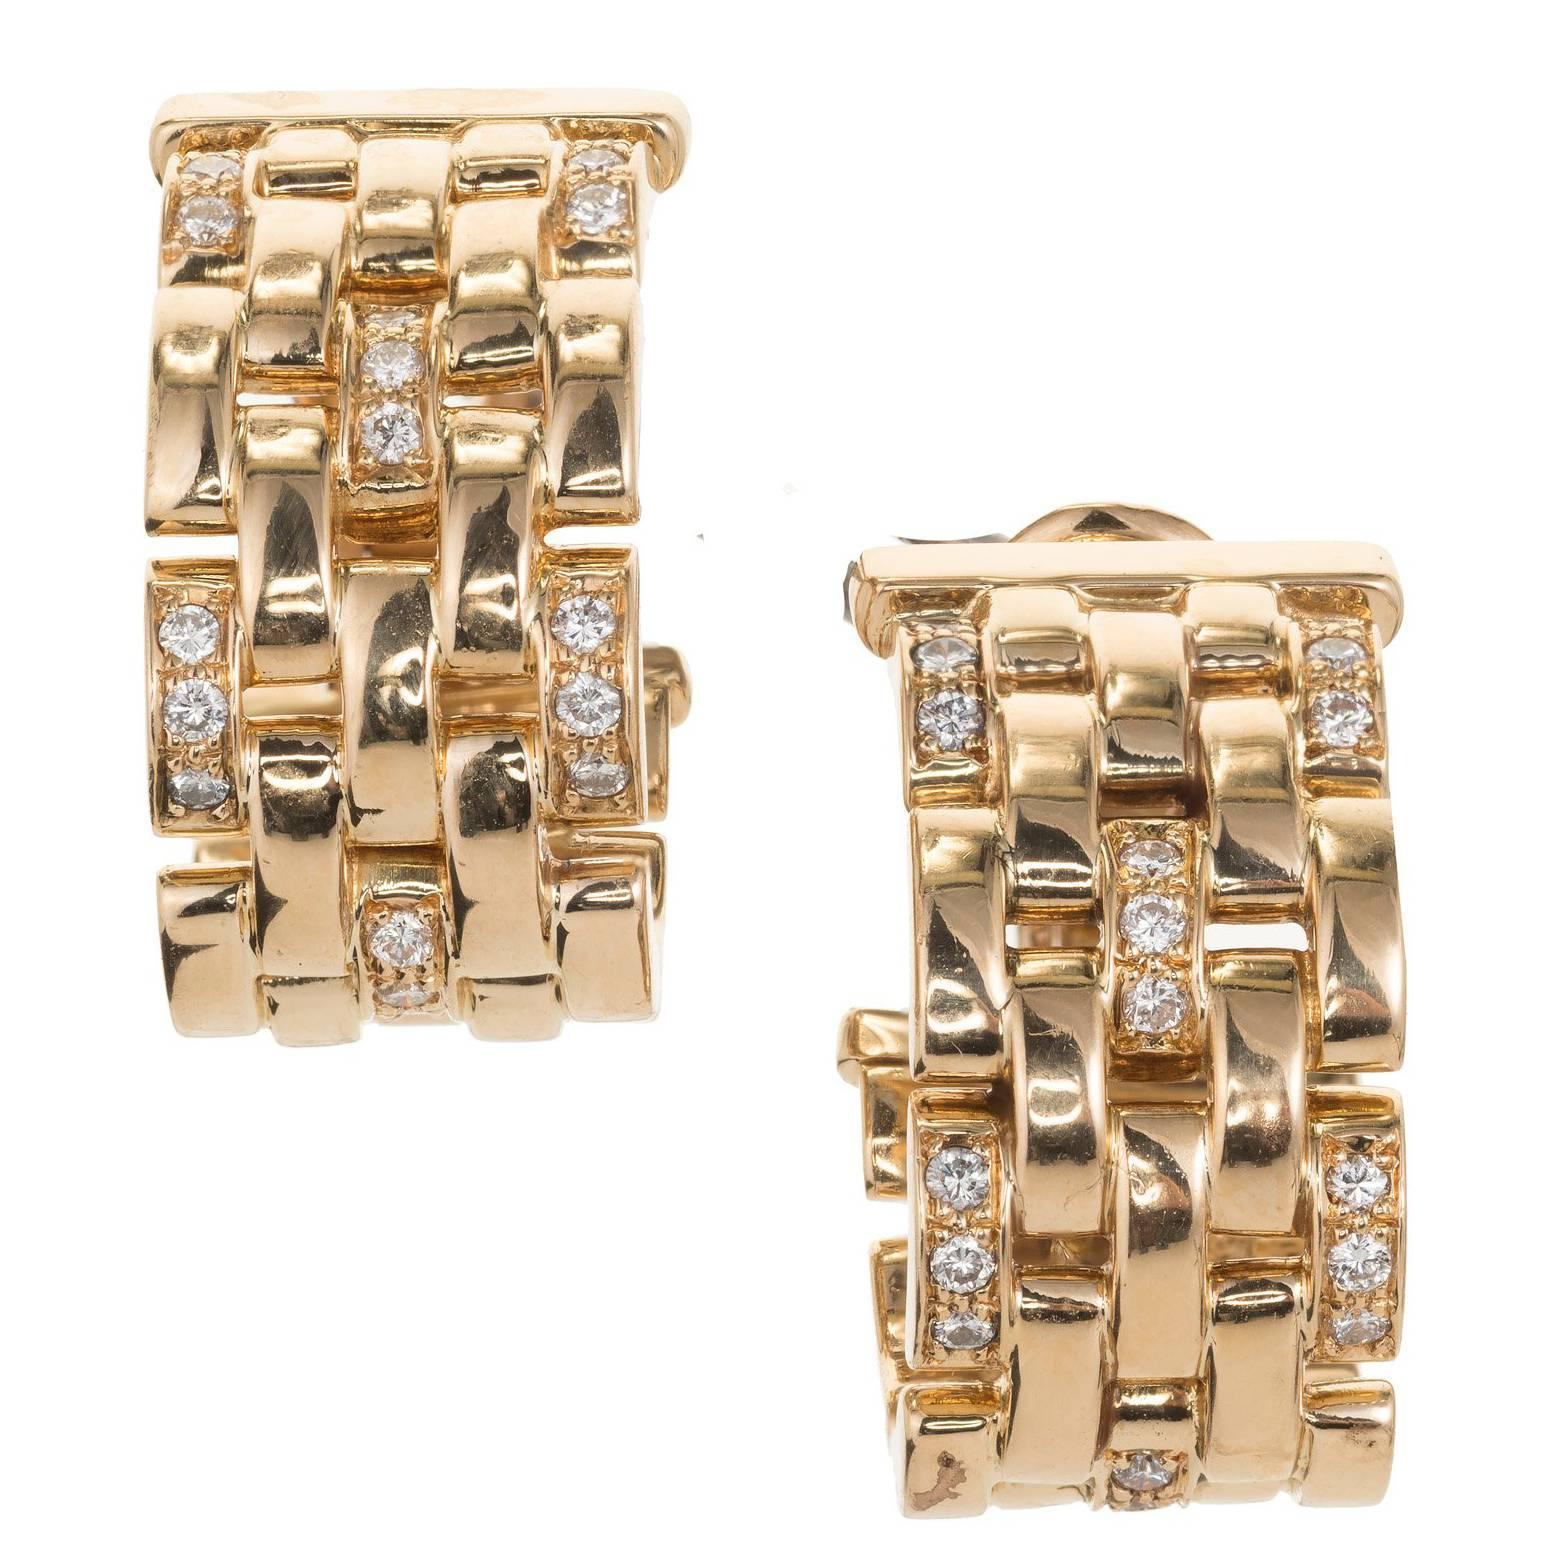 Cartier Maillon Panthere .50 Carat Diamond Five-Row Gold Hoop Earrings